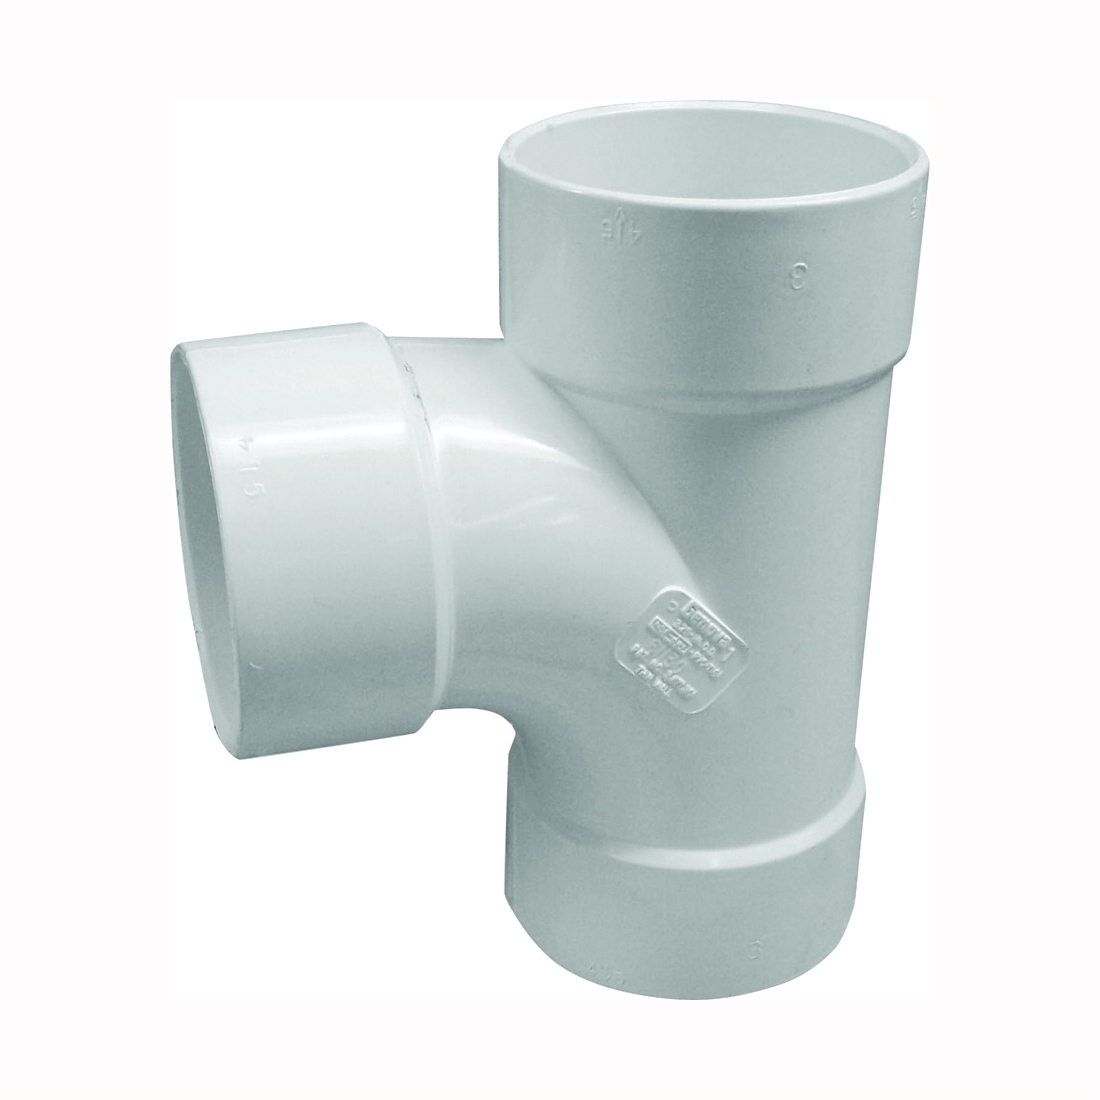 Picture of GENOVA 400 41140 Sanitary Tee, 4 in, Hub, PVC, White